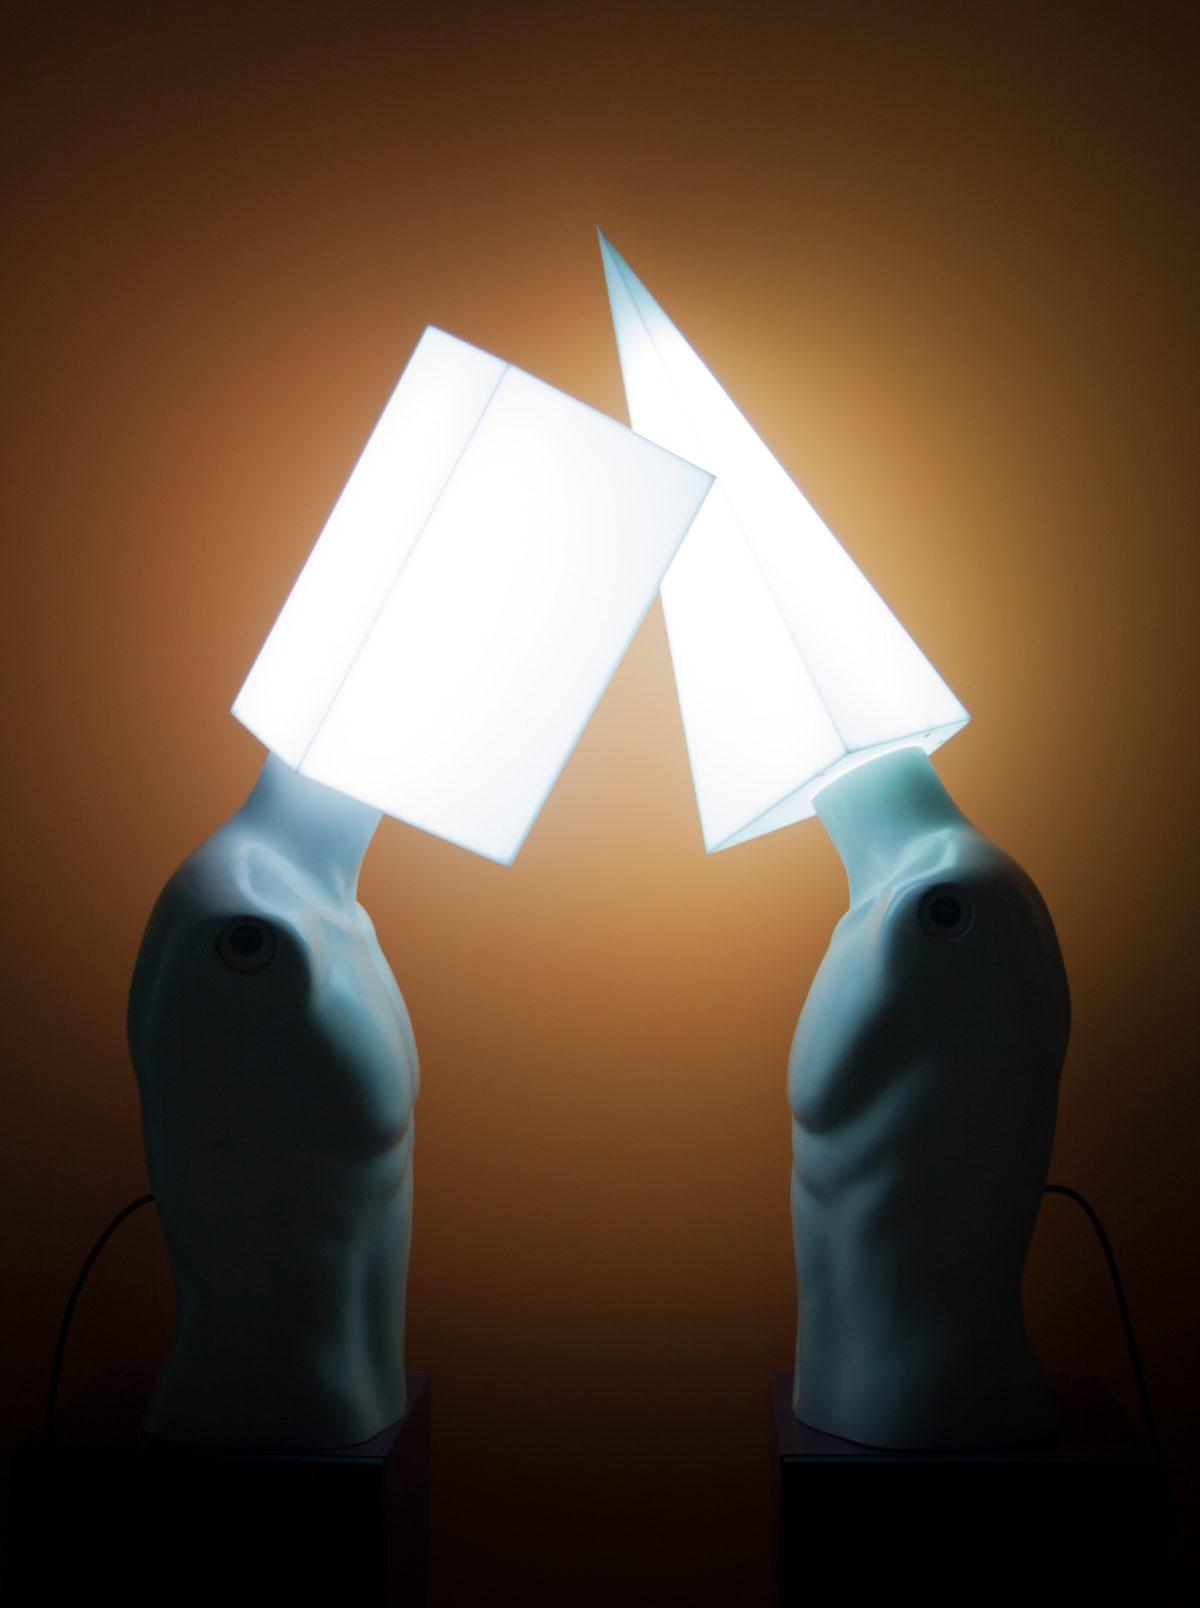 Debate - Light & sound installation - mixed media, electronics, programming (naked figures), mannequin, light, sculpture, ch3